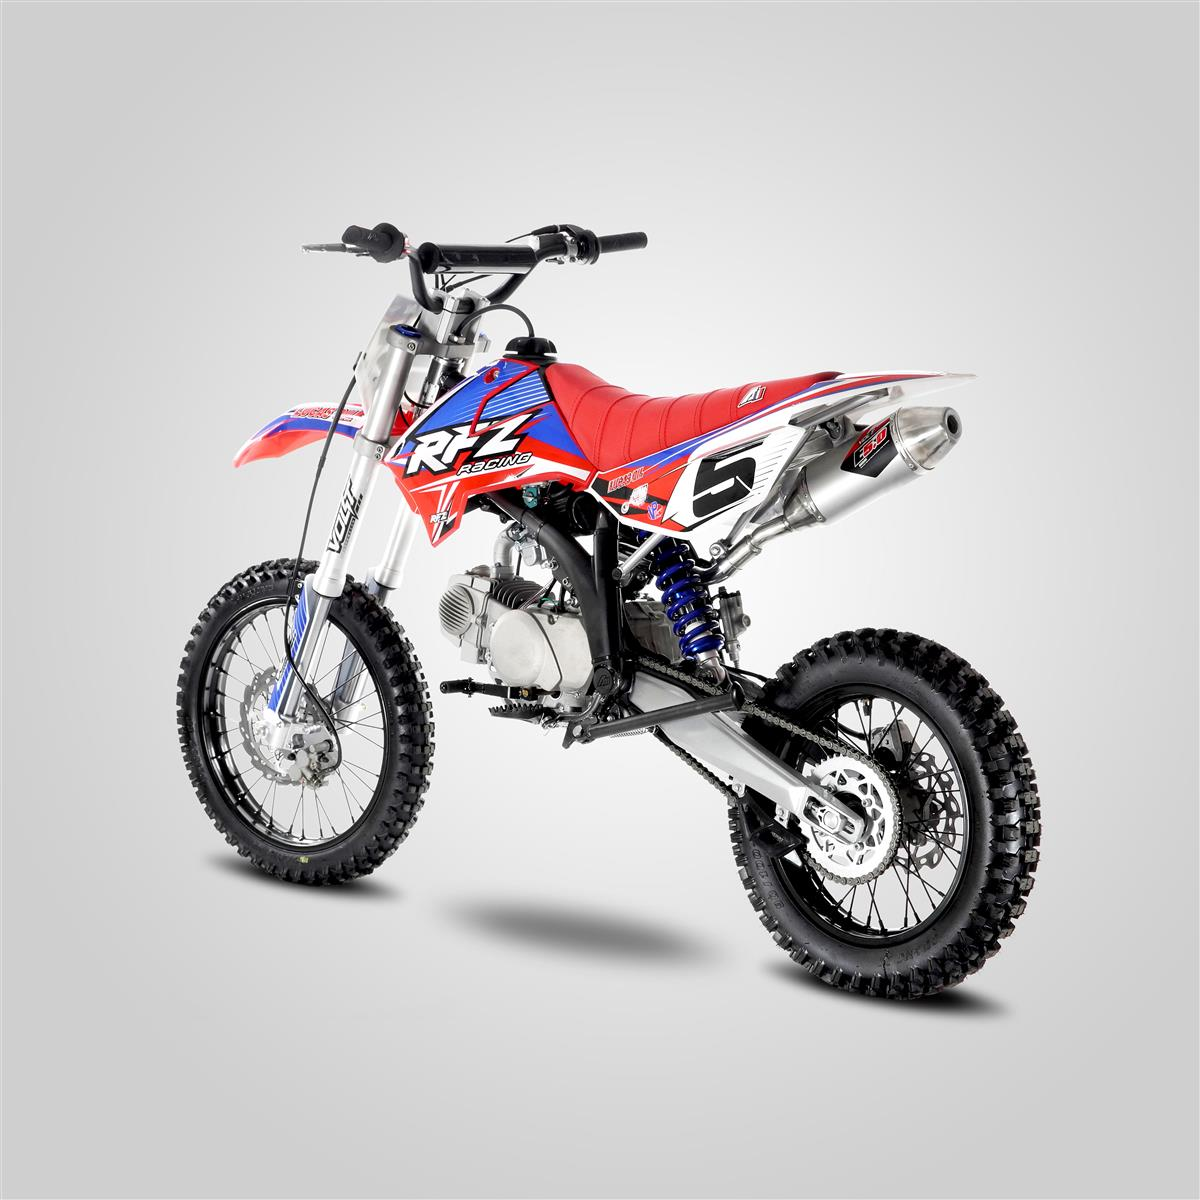 minicross apollo rfz open lwb 150 14 17 smallmx dirt bike. Black Bedroom Furniture Sets. Home Design Ideas